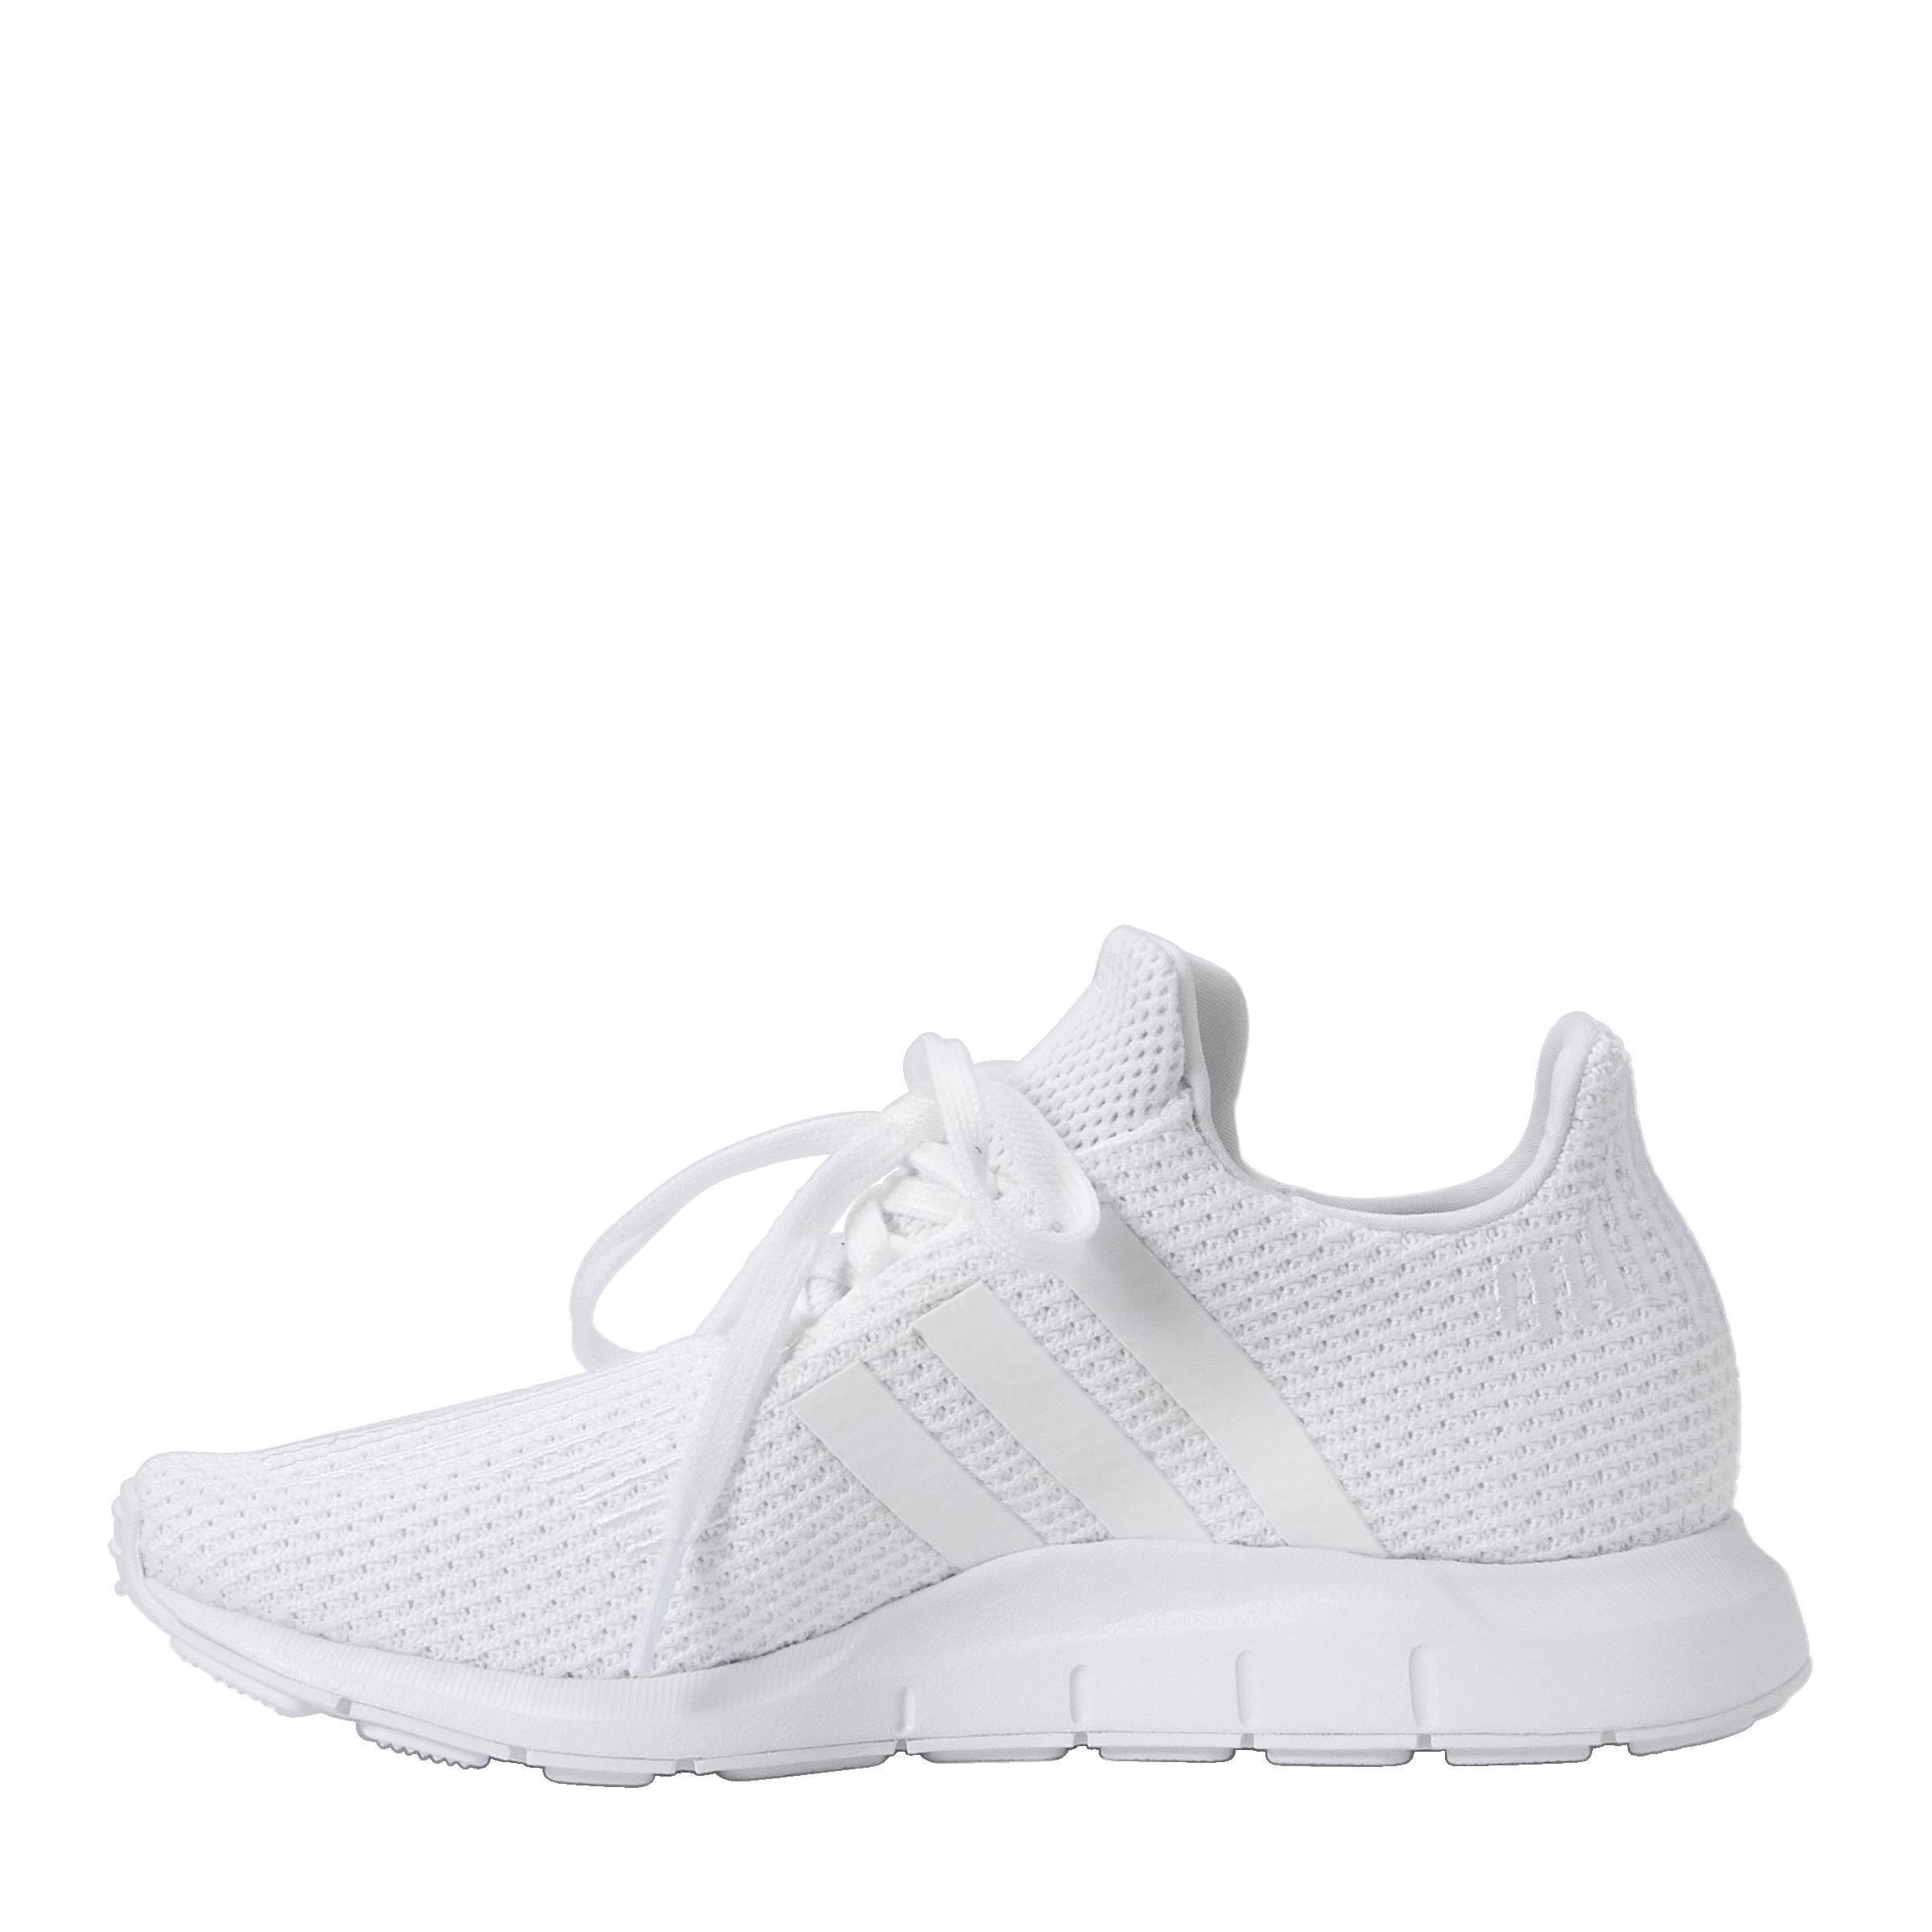 adidas originals Swift Run W sneakers